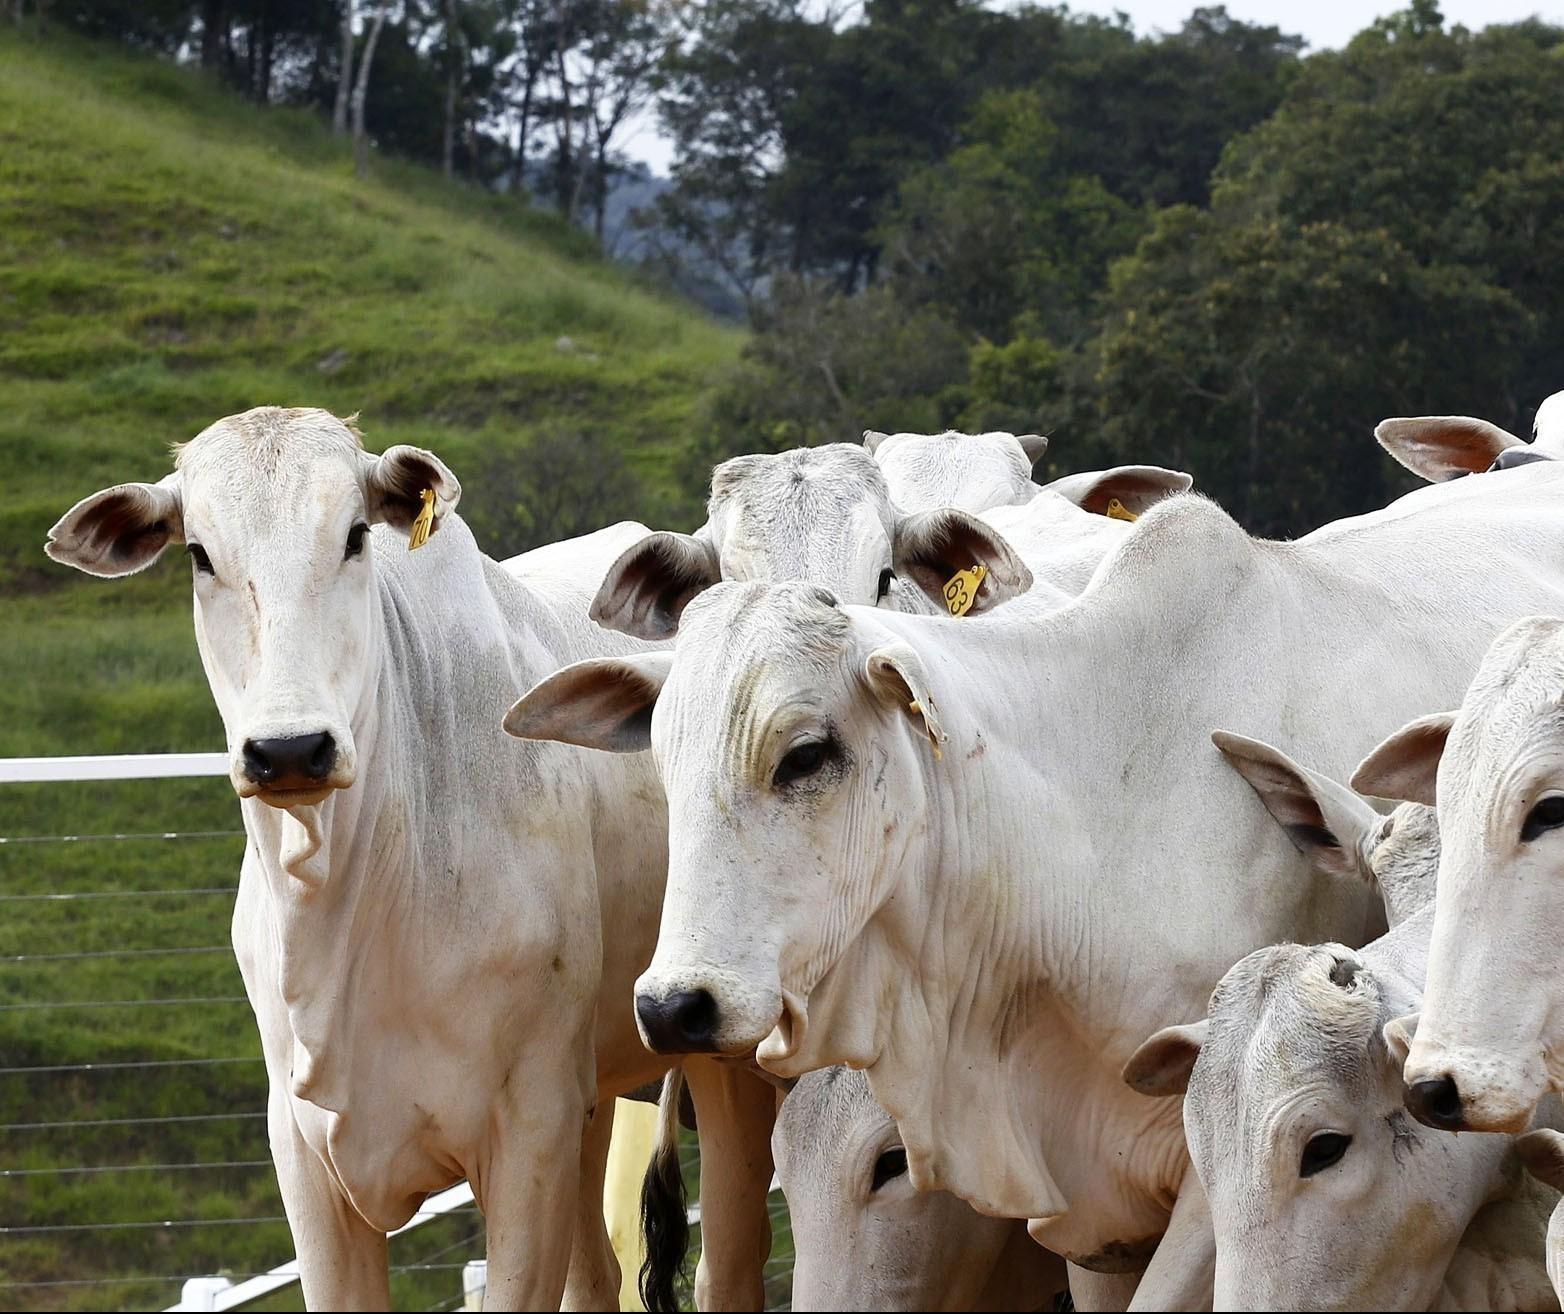 Mercado do boi gordo mostra estabilidade dos preços